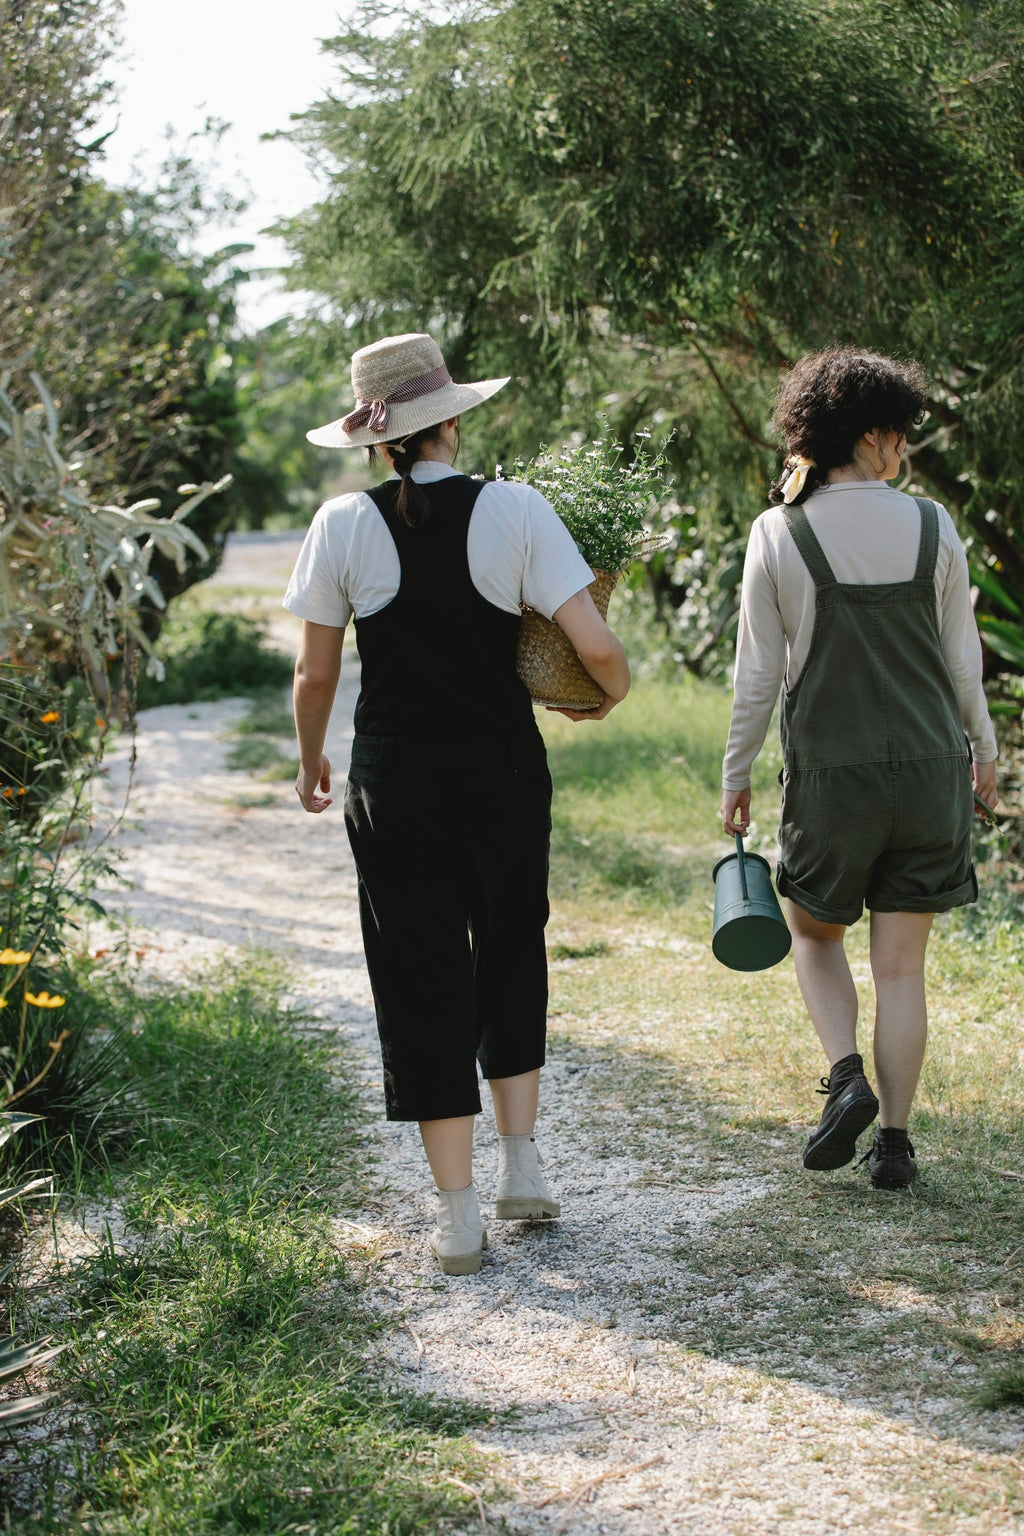 Two people walking in a rural ambience